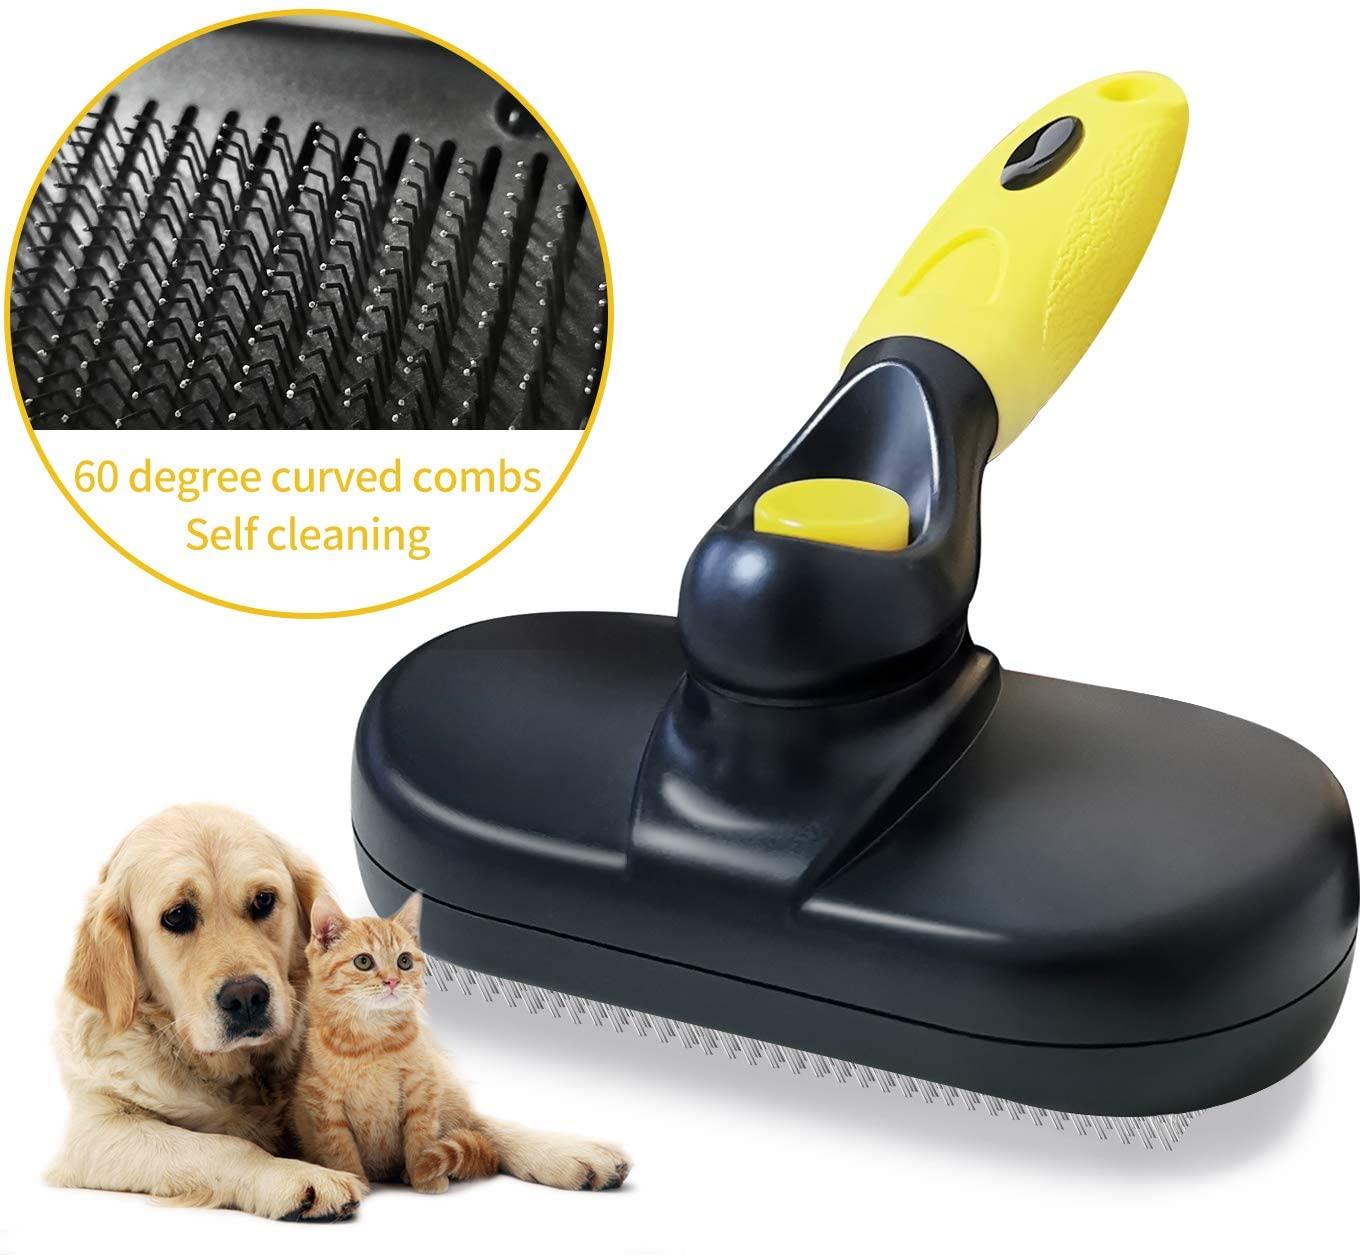 Cepillo de peluquería para perros con cepillo de pelo corto a largo que elimina el suministro de cepillo de pelo para mascotas para perros grandes